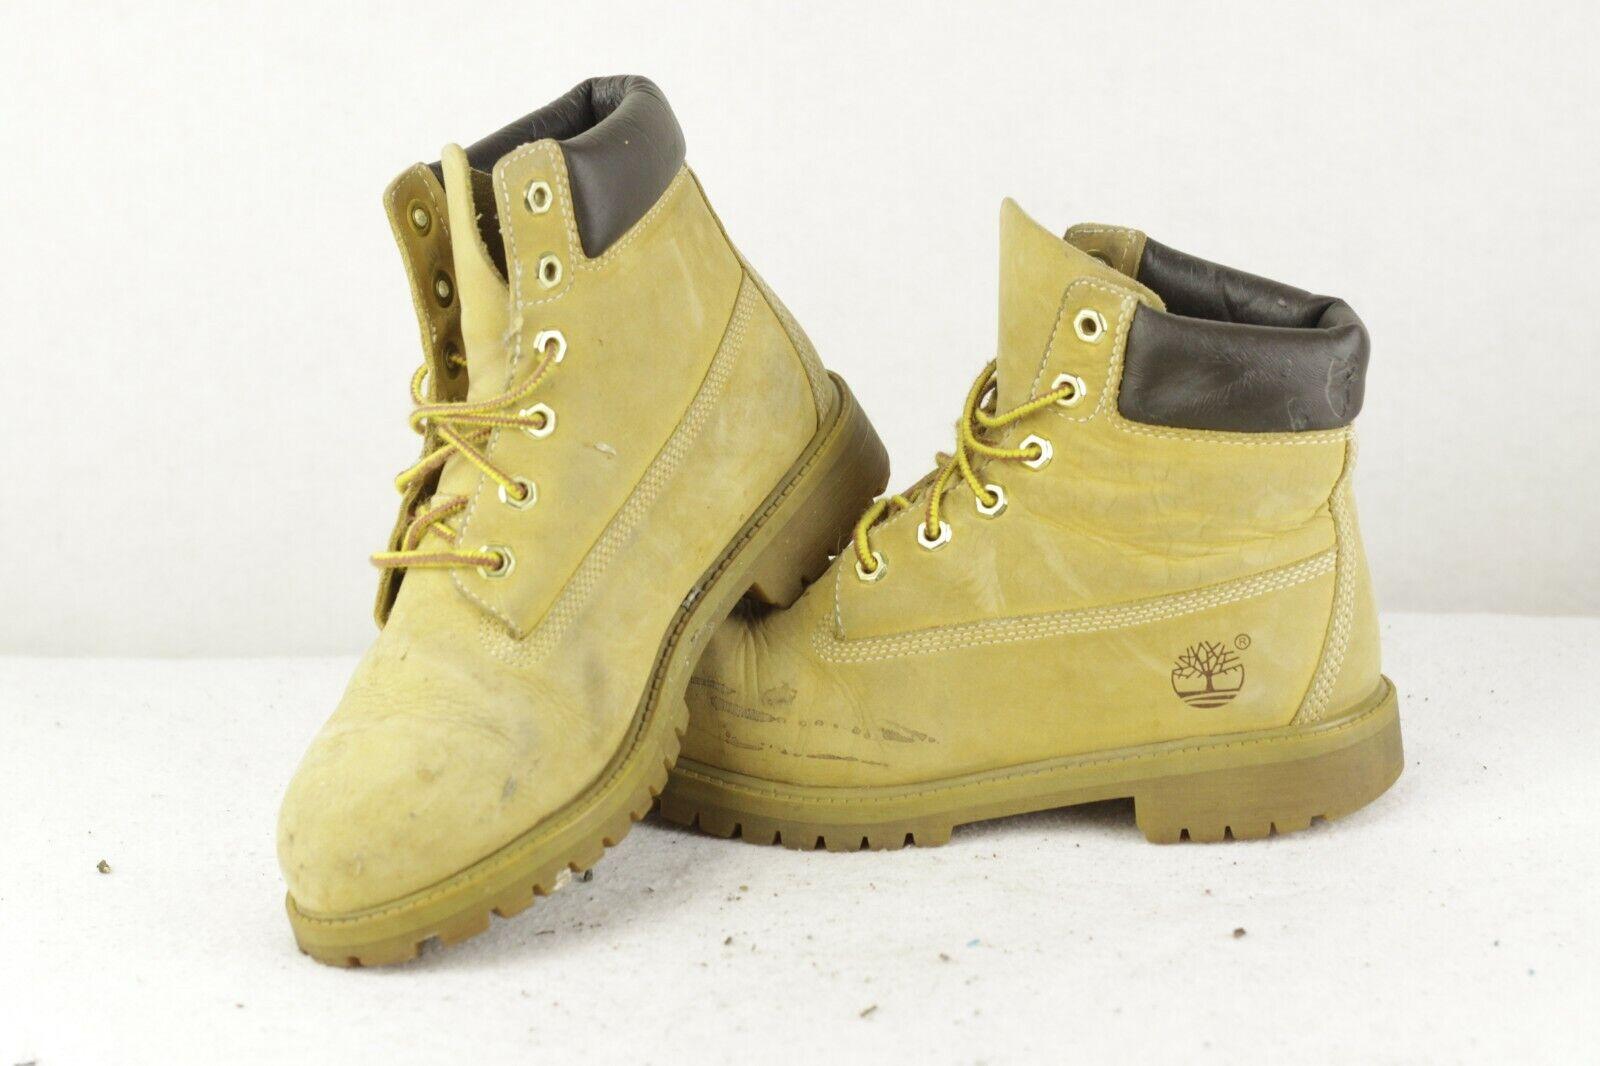 HERITAGE damen TIMBERLAND Leather Stiefel WATERPROOF Wheat 4.5UK P54    Spezielle Funktion